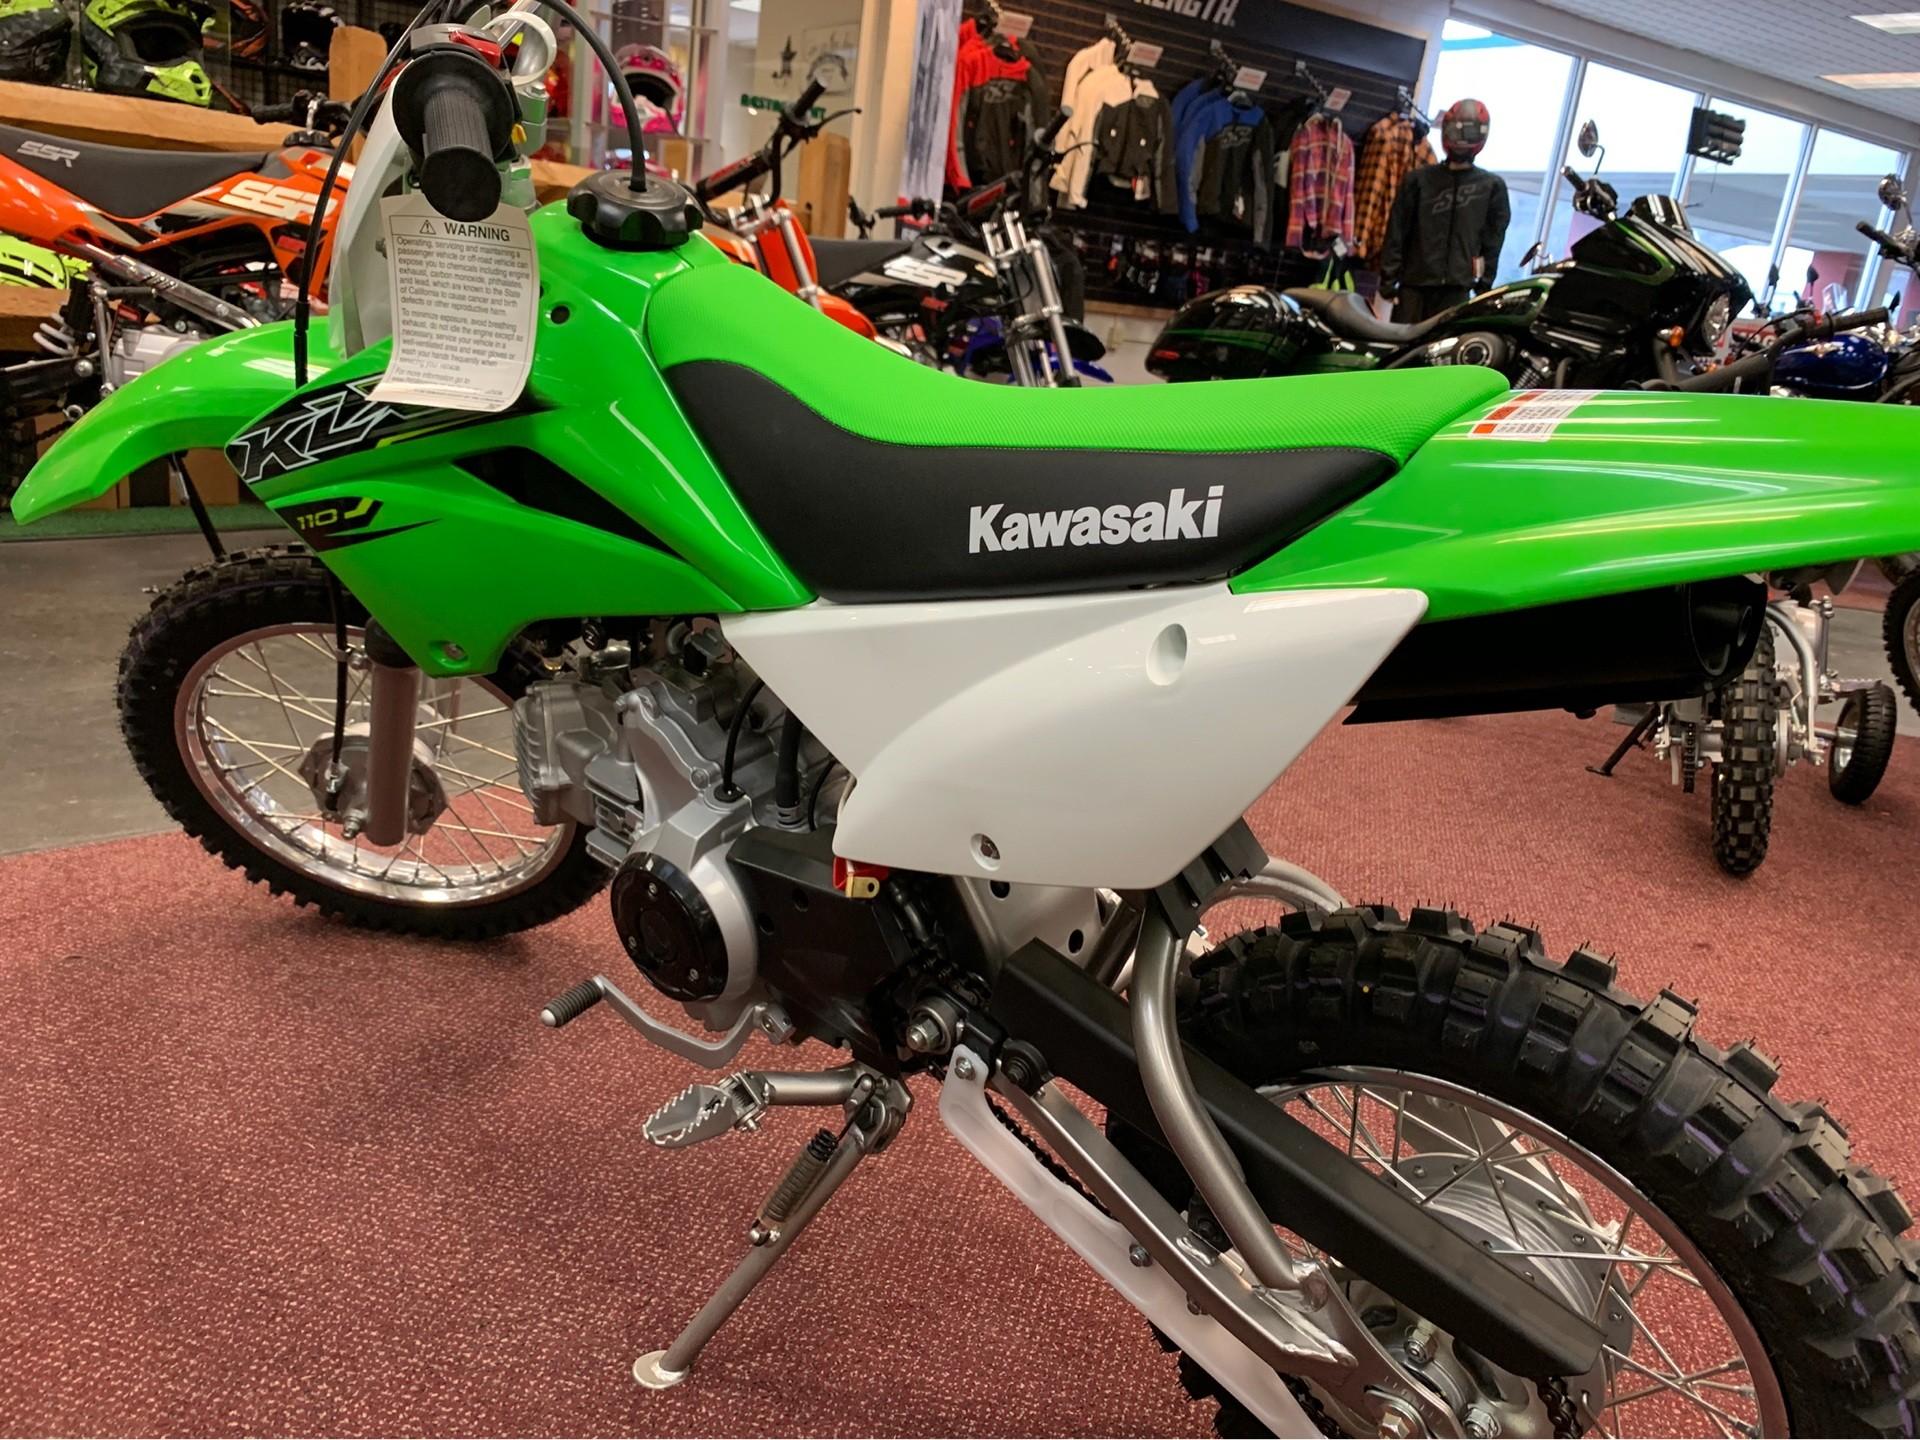 2019 Kawasaki KLX 110 in Petersburg, West Virginia